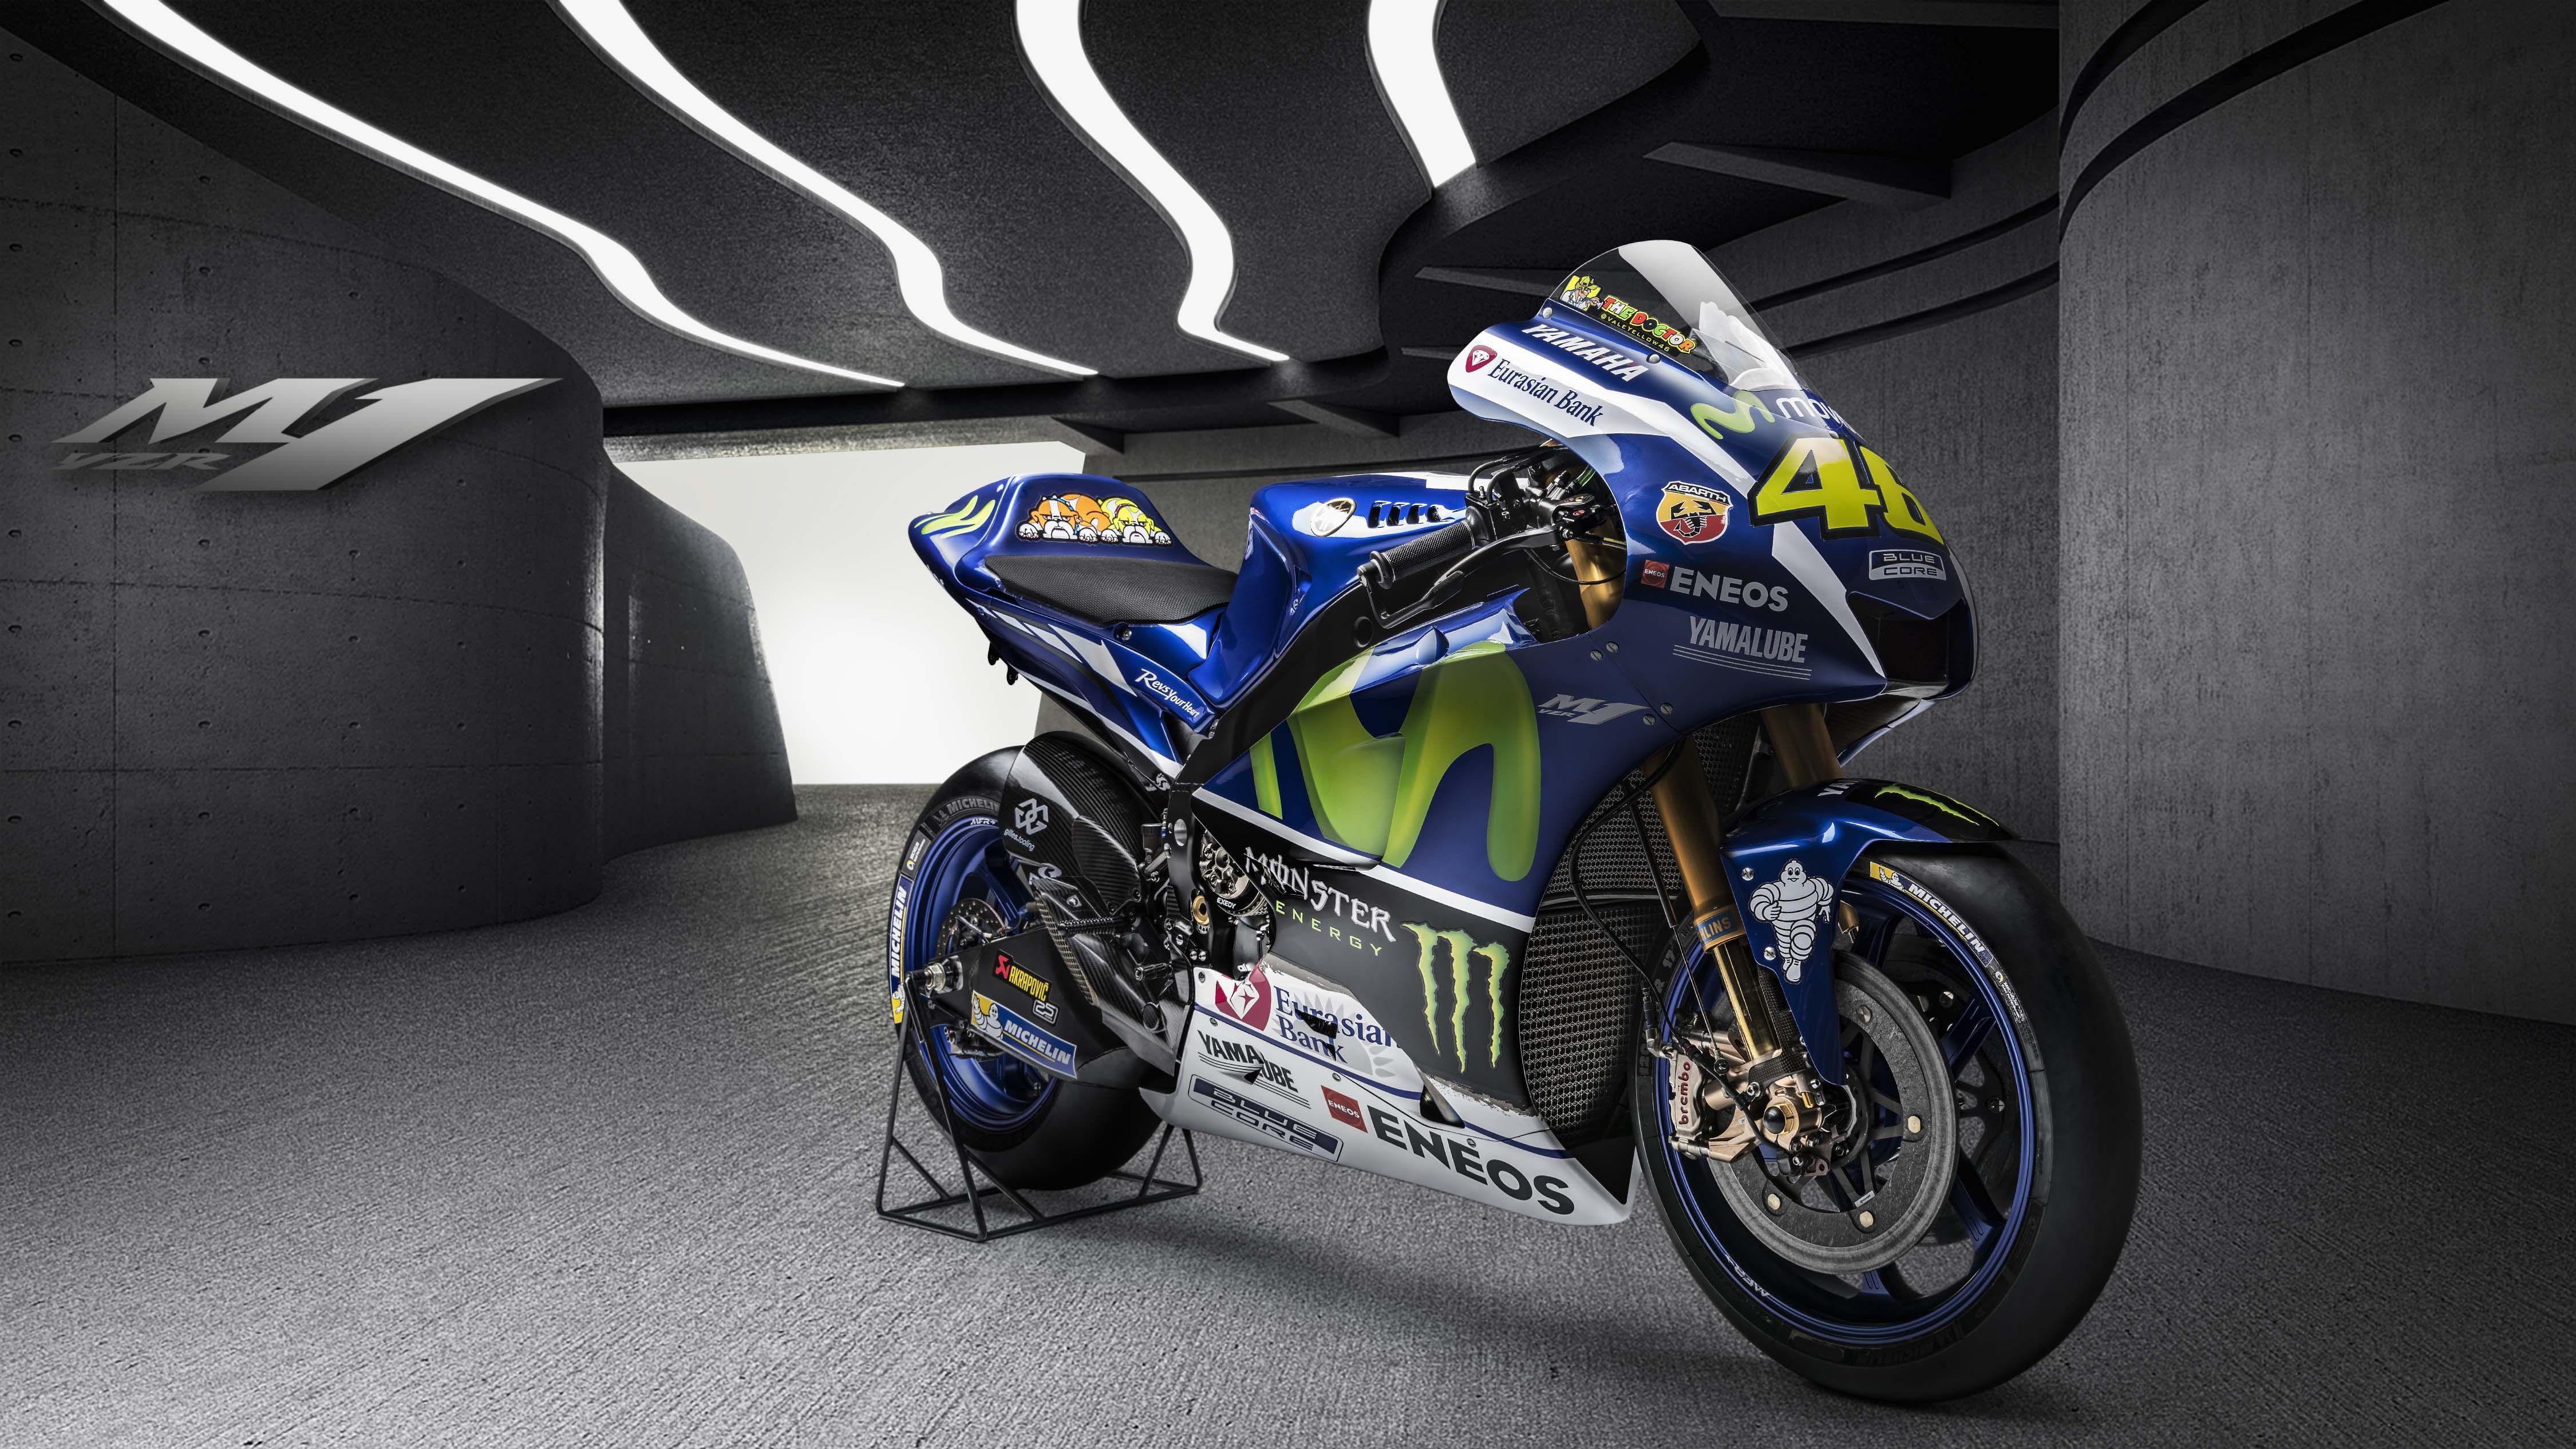 Yamaha YZR-M1 2018 Wallpapers